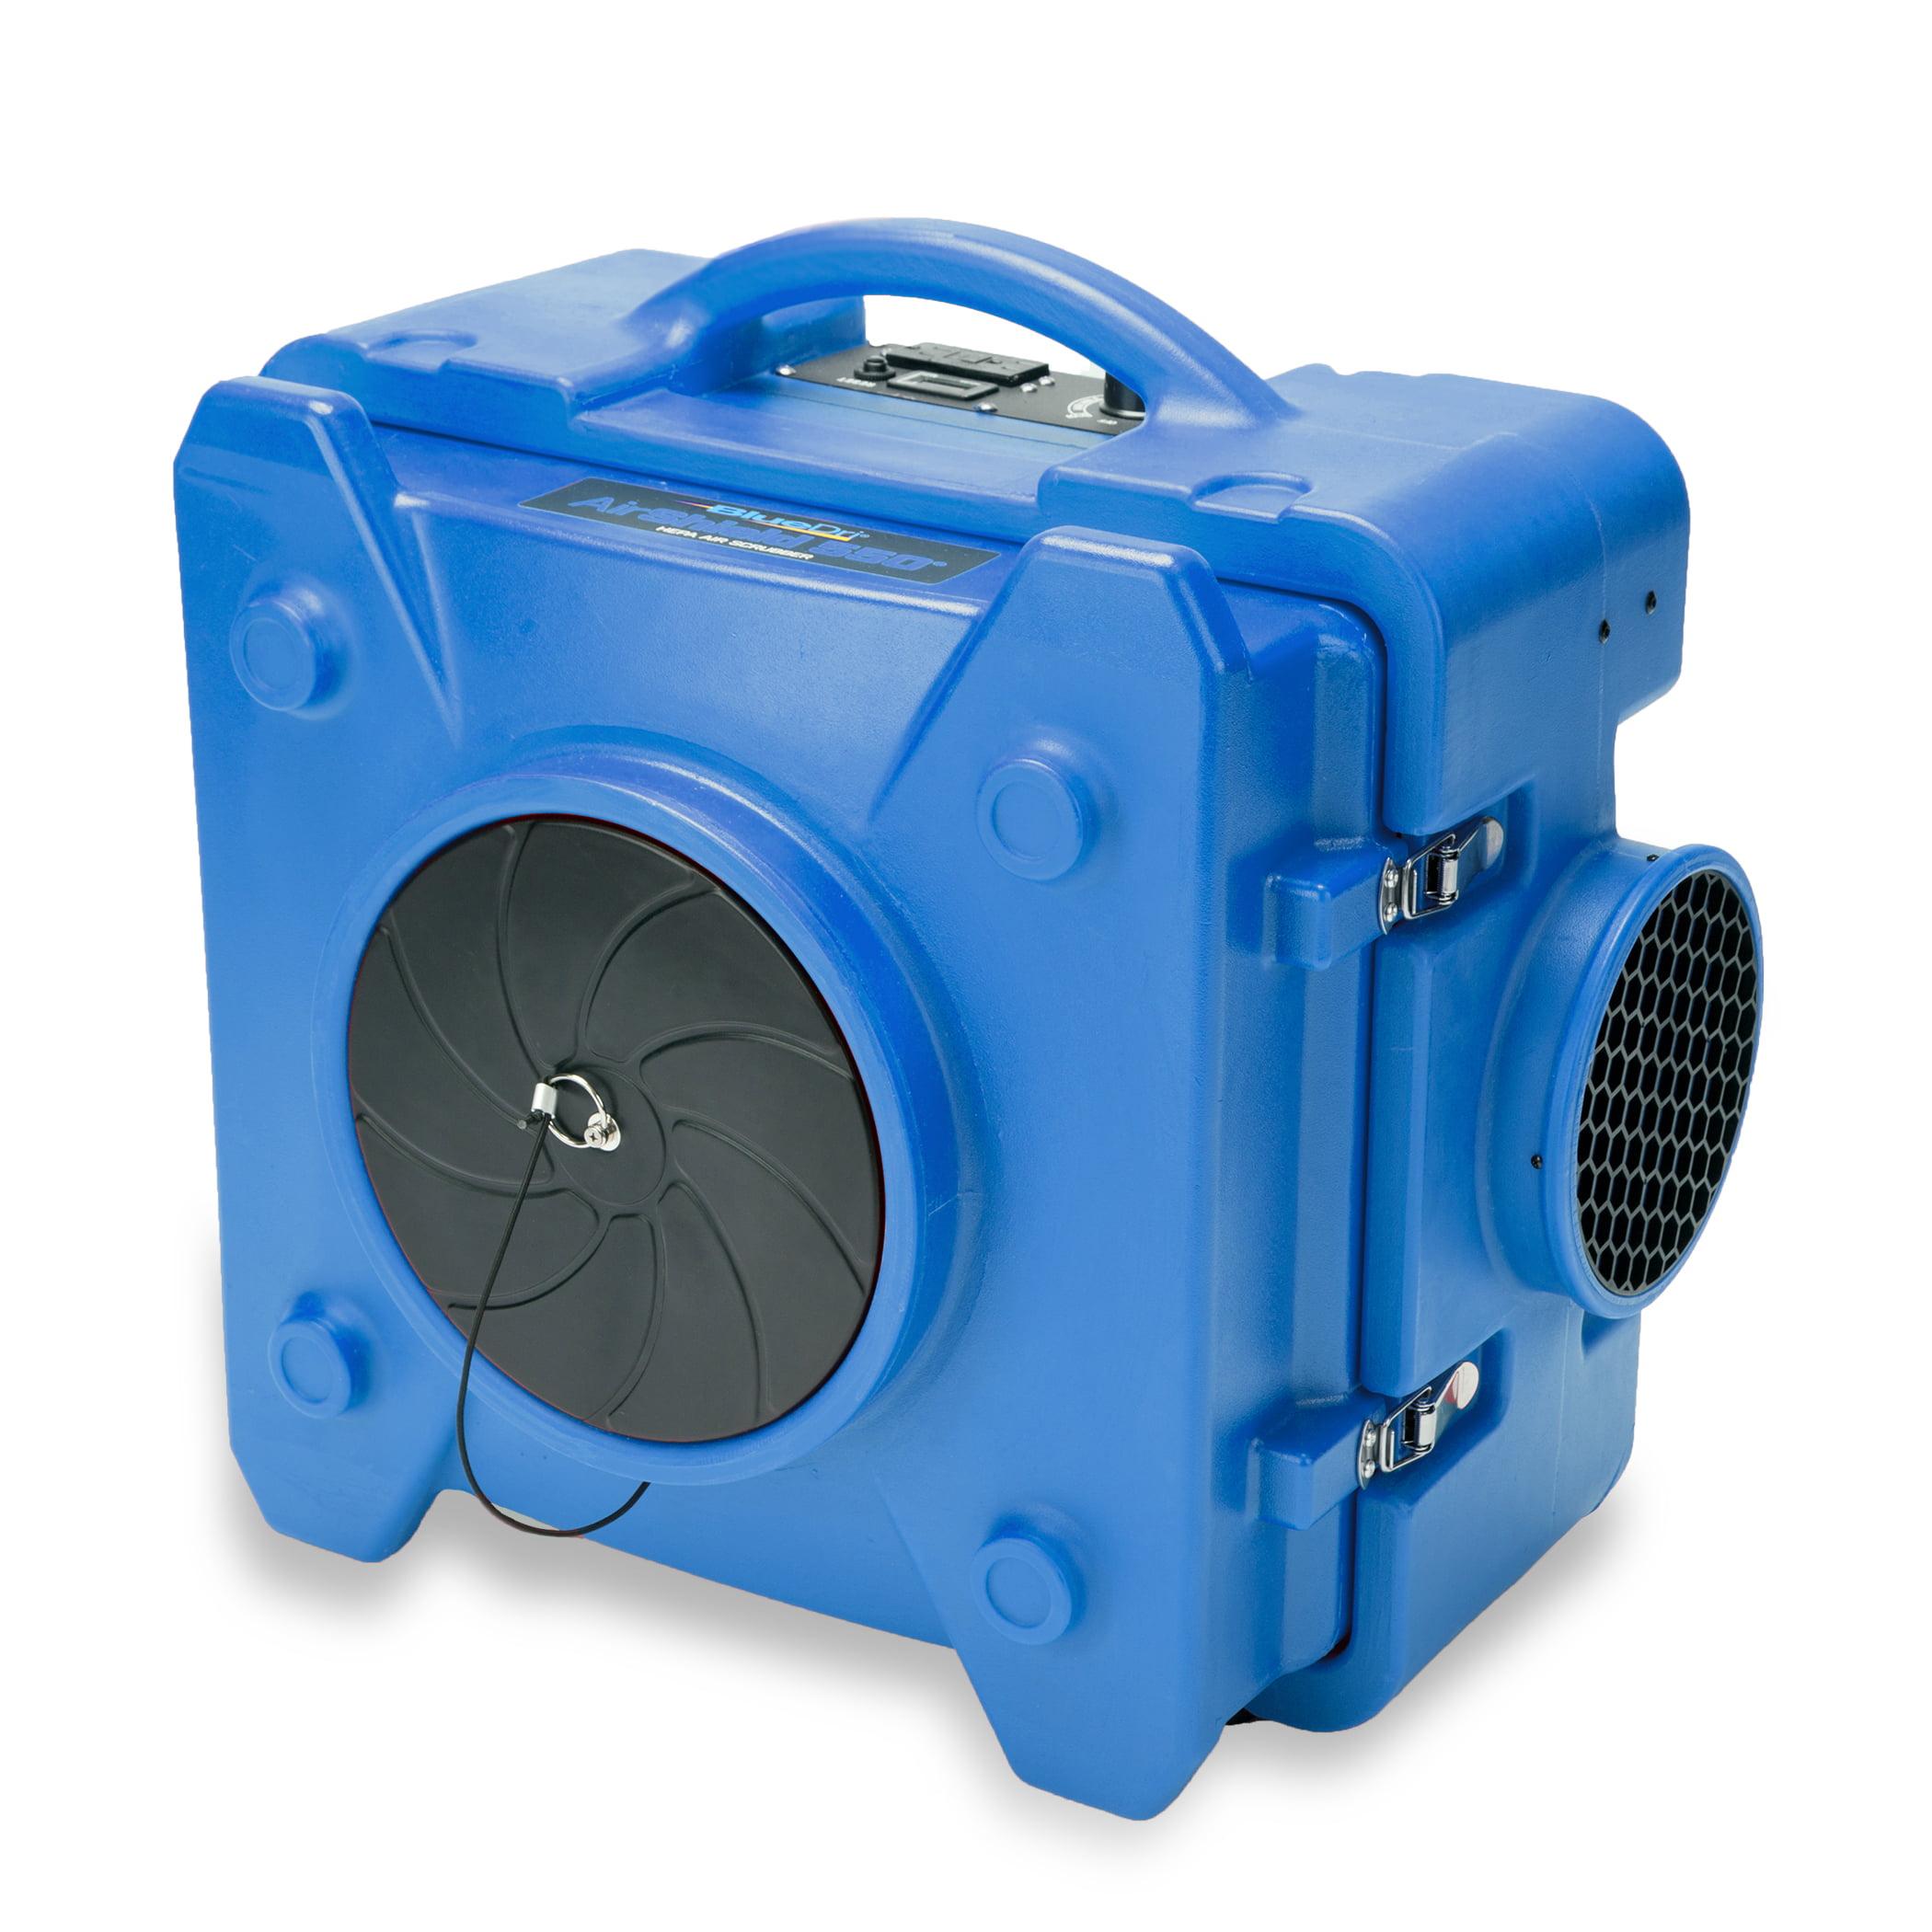 BlueDri AS-550 Blue Air Scrubber, Negative Air Machine, HEPA Air Purifier, Air Filter To Eliminate Smoke, Mold, and Pet Dander, Blue